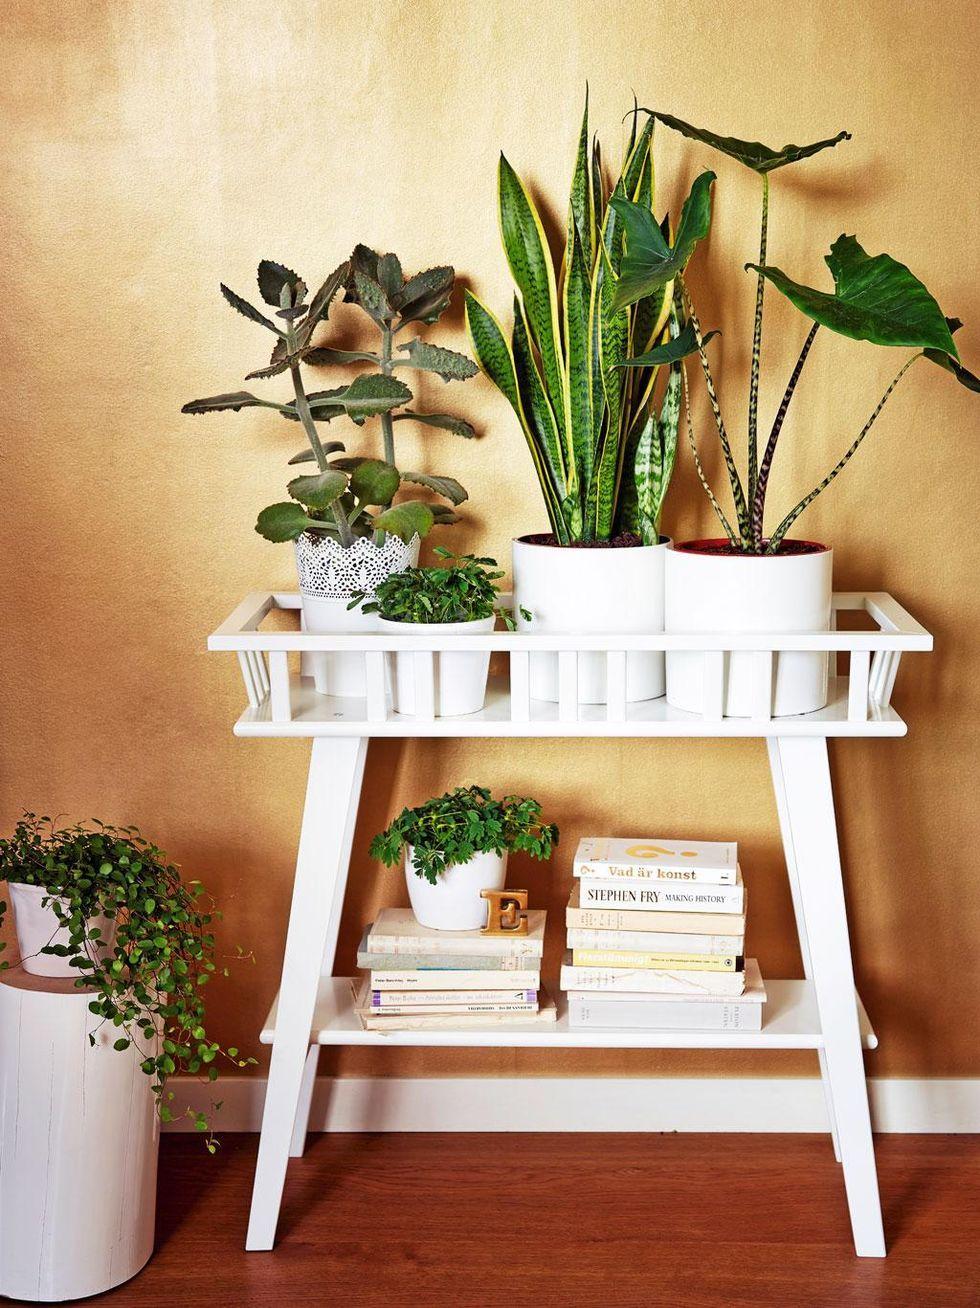 Lantliv ikea plant stand indoor plants pinteres Plantillas decorativas ikea